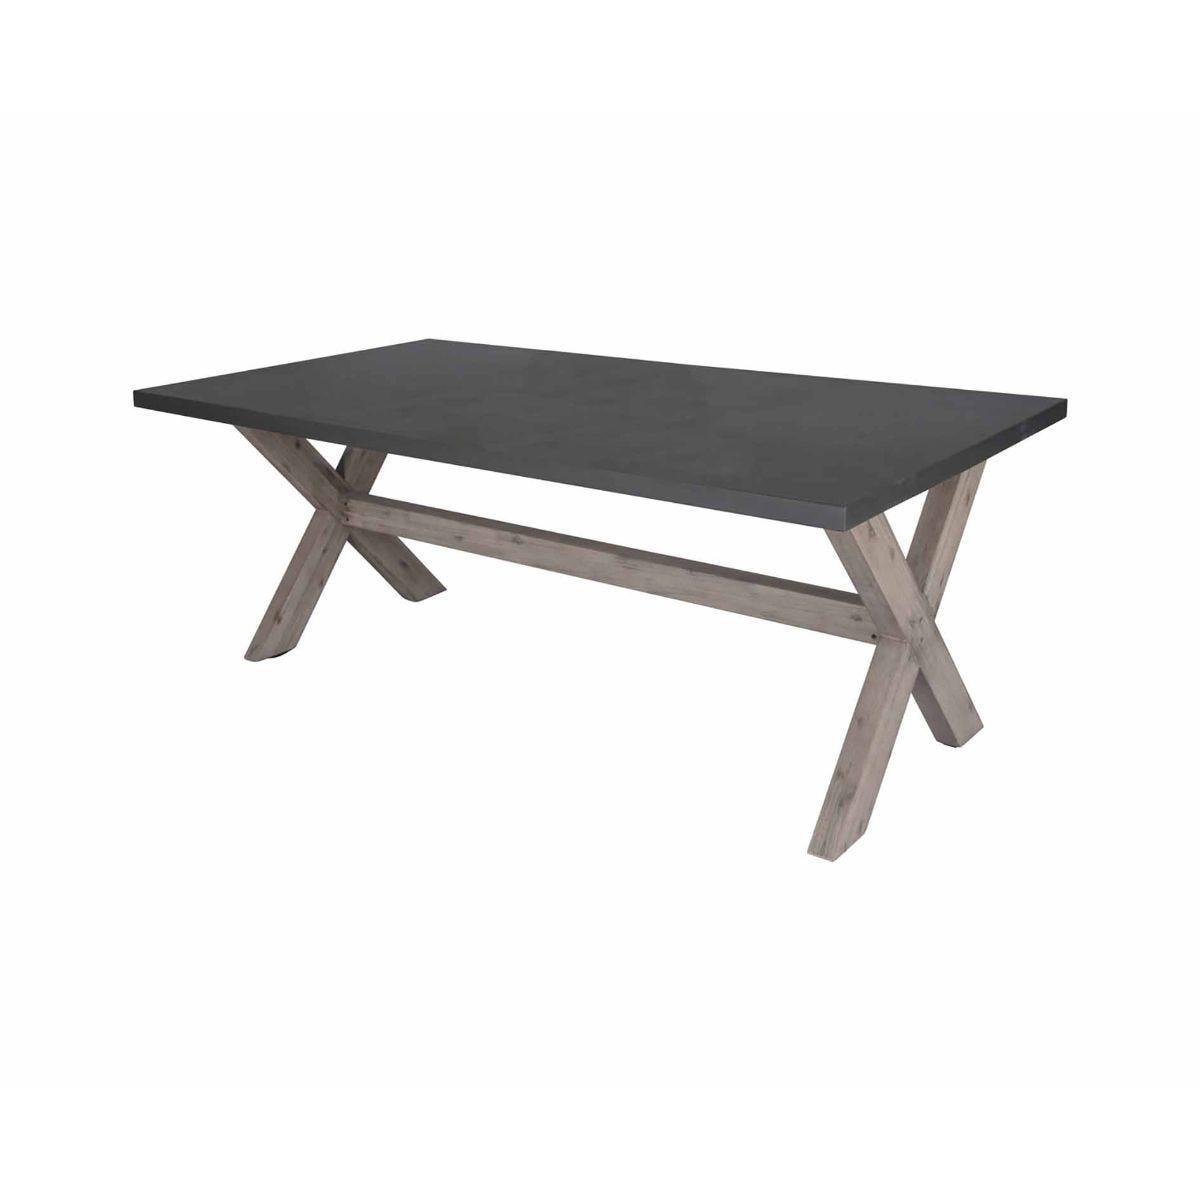 Charles Bentley Concrete Wood Rectangular Garden Dining Table, Grey